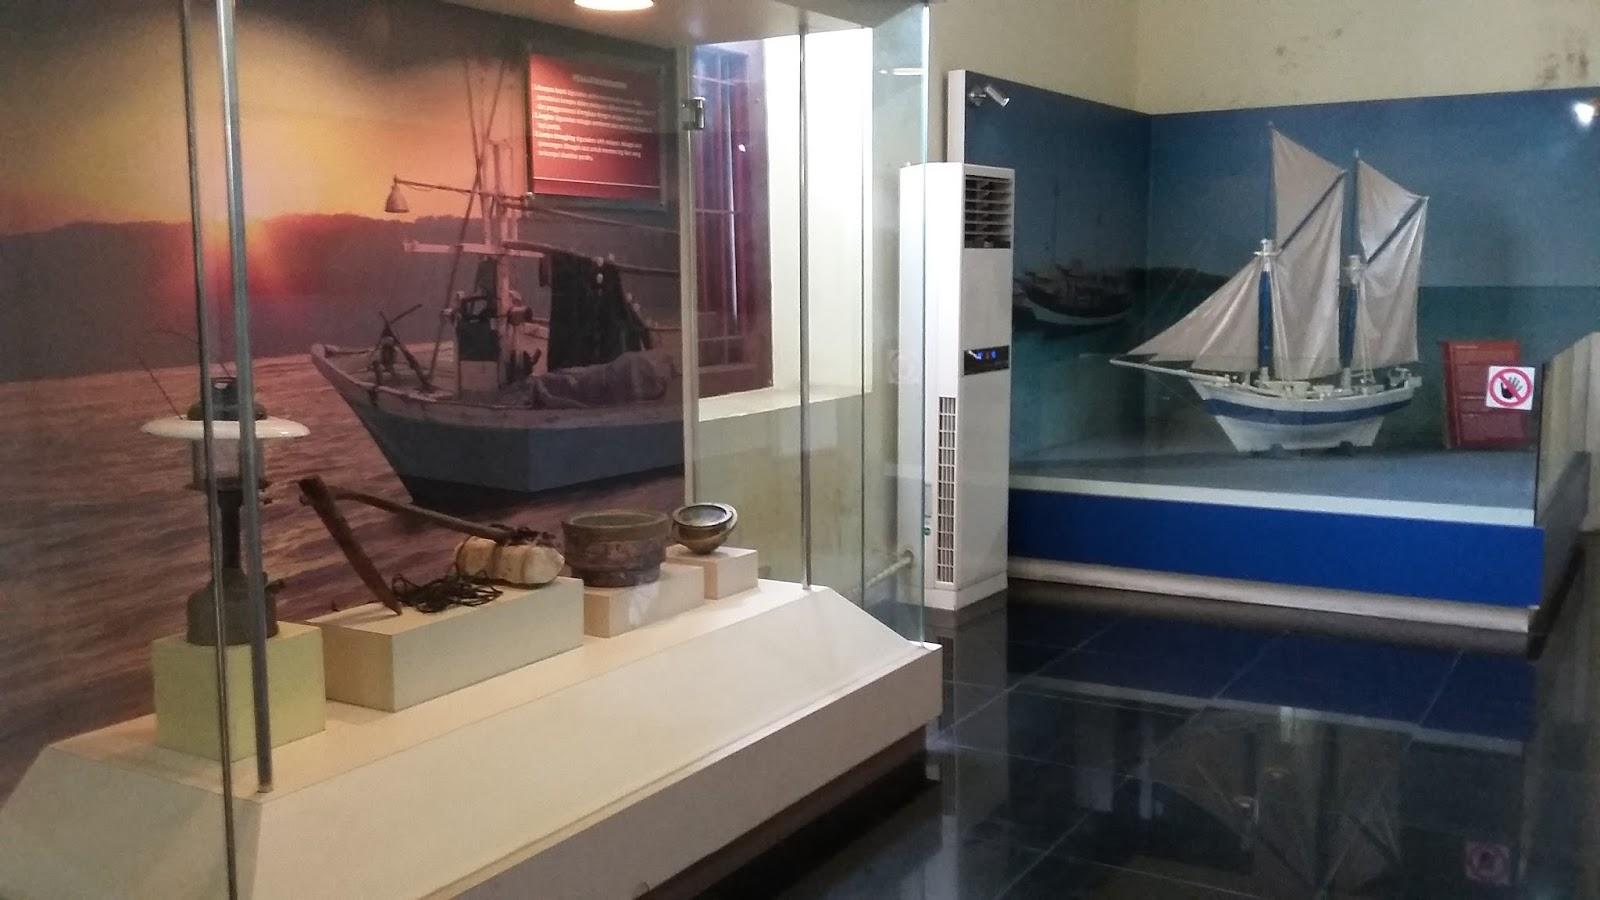 Pengelolaan Museum La Galigo Sebagai Daya Tarik Wisata Buatan Gambar